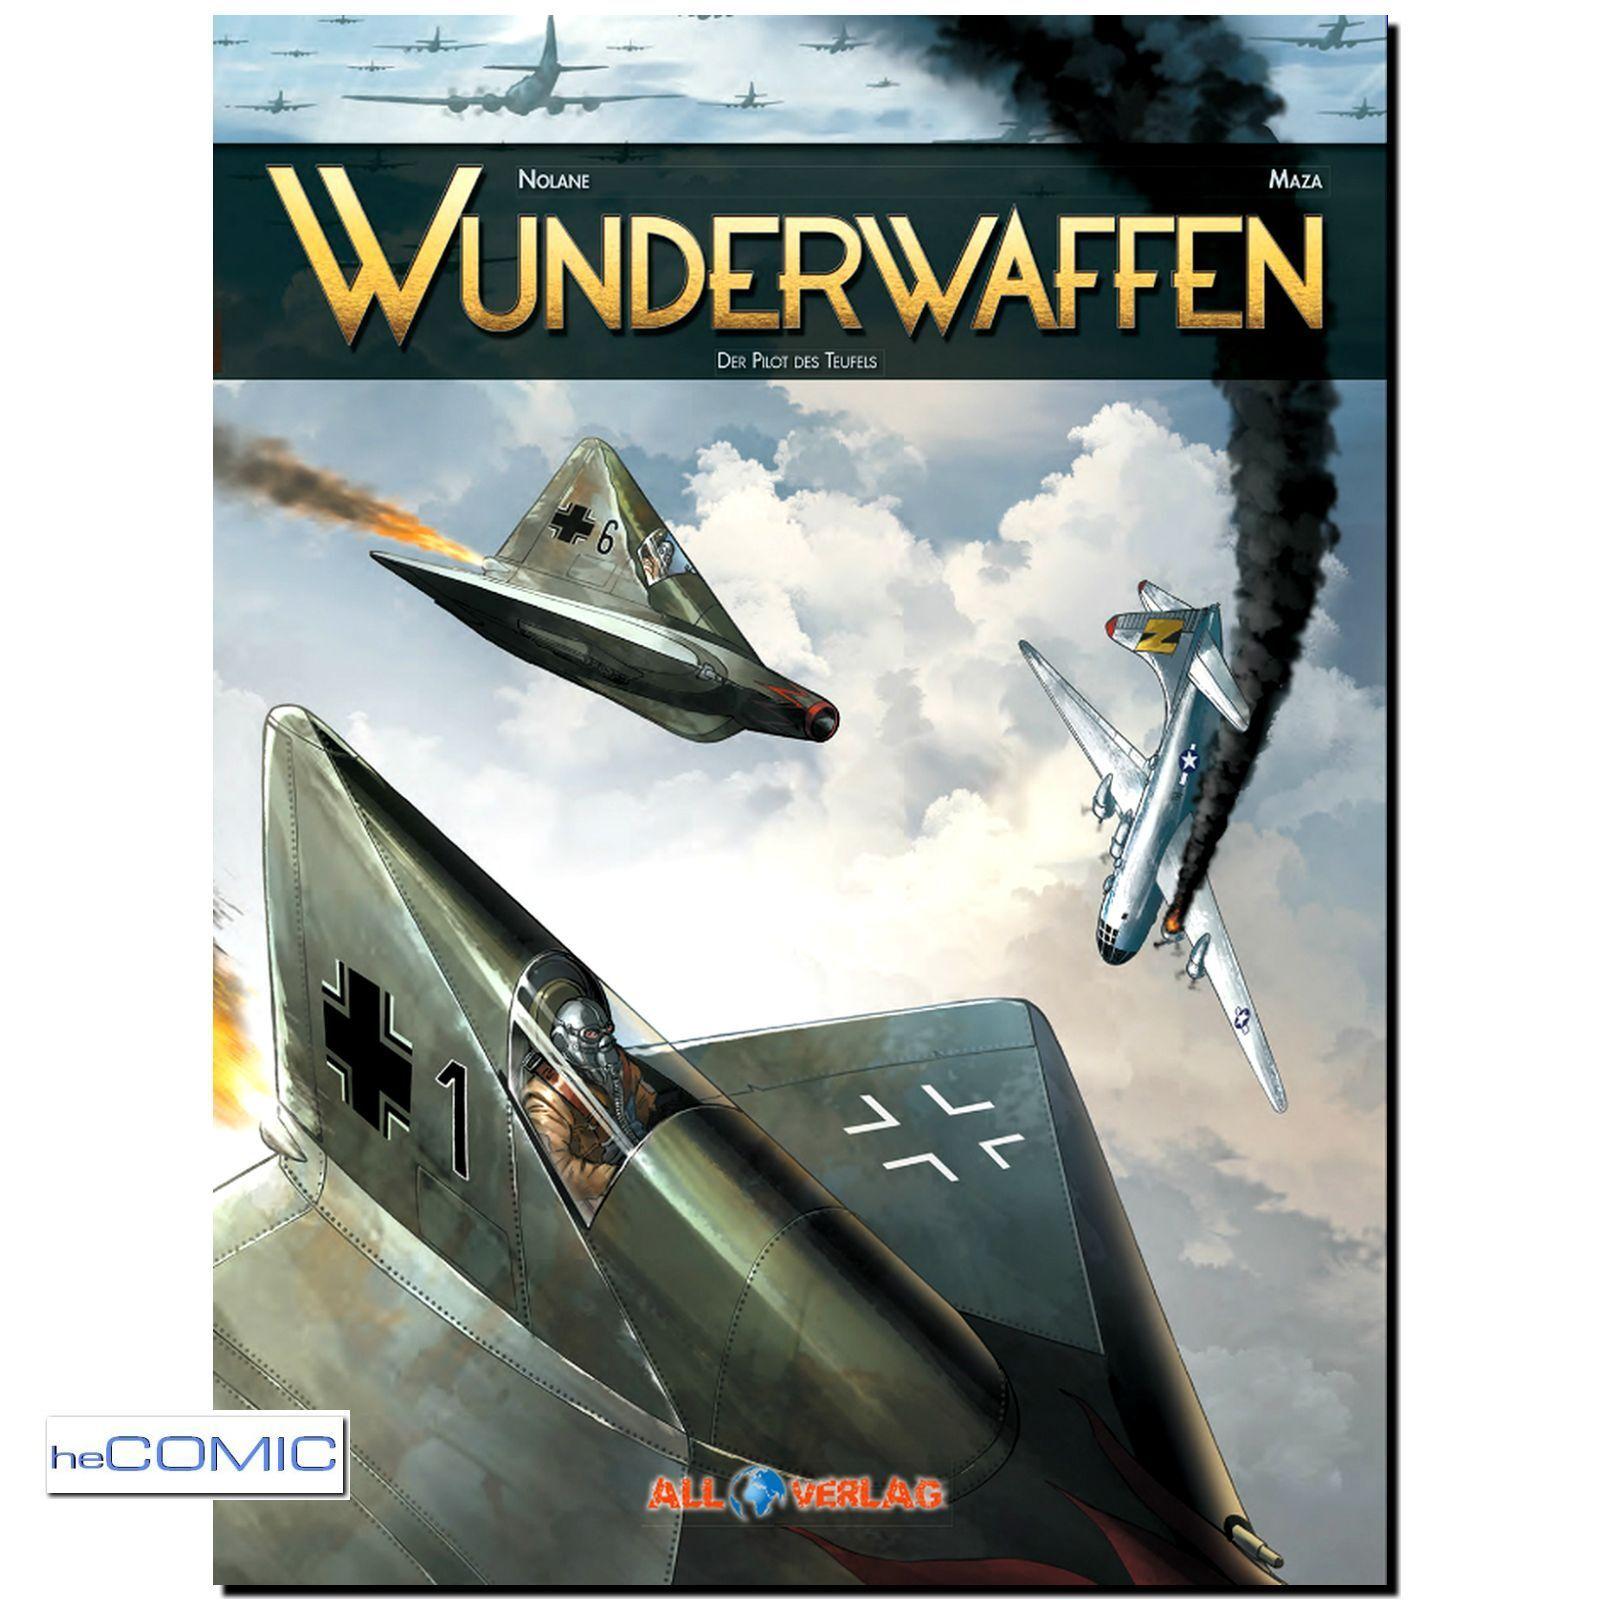 heComic: FLIEGERSTAFFEL | HISTORY 1940 Wunderwaffen Pilot des Teufels. Irrwitzige Dystopie mit Leseprobe